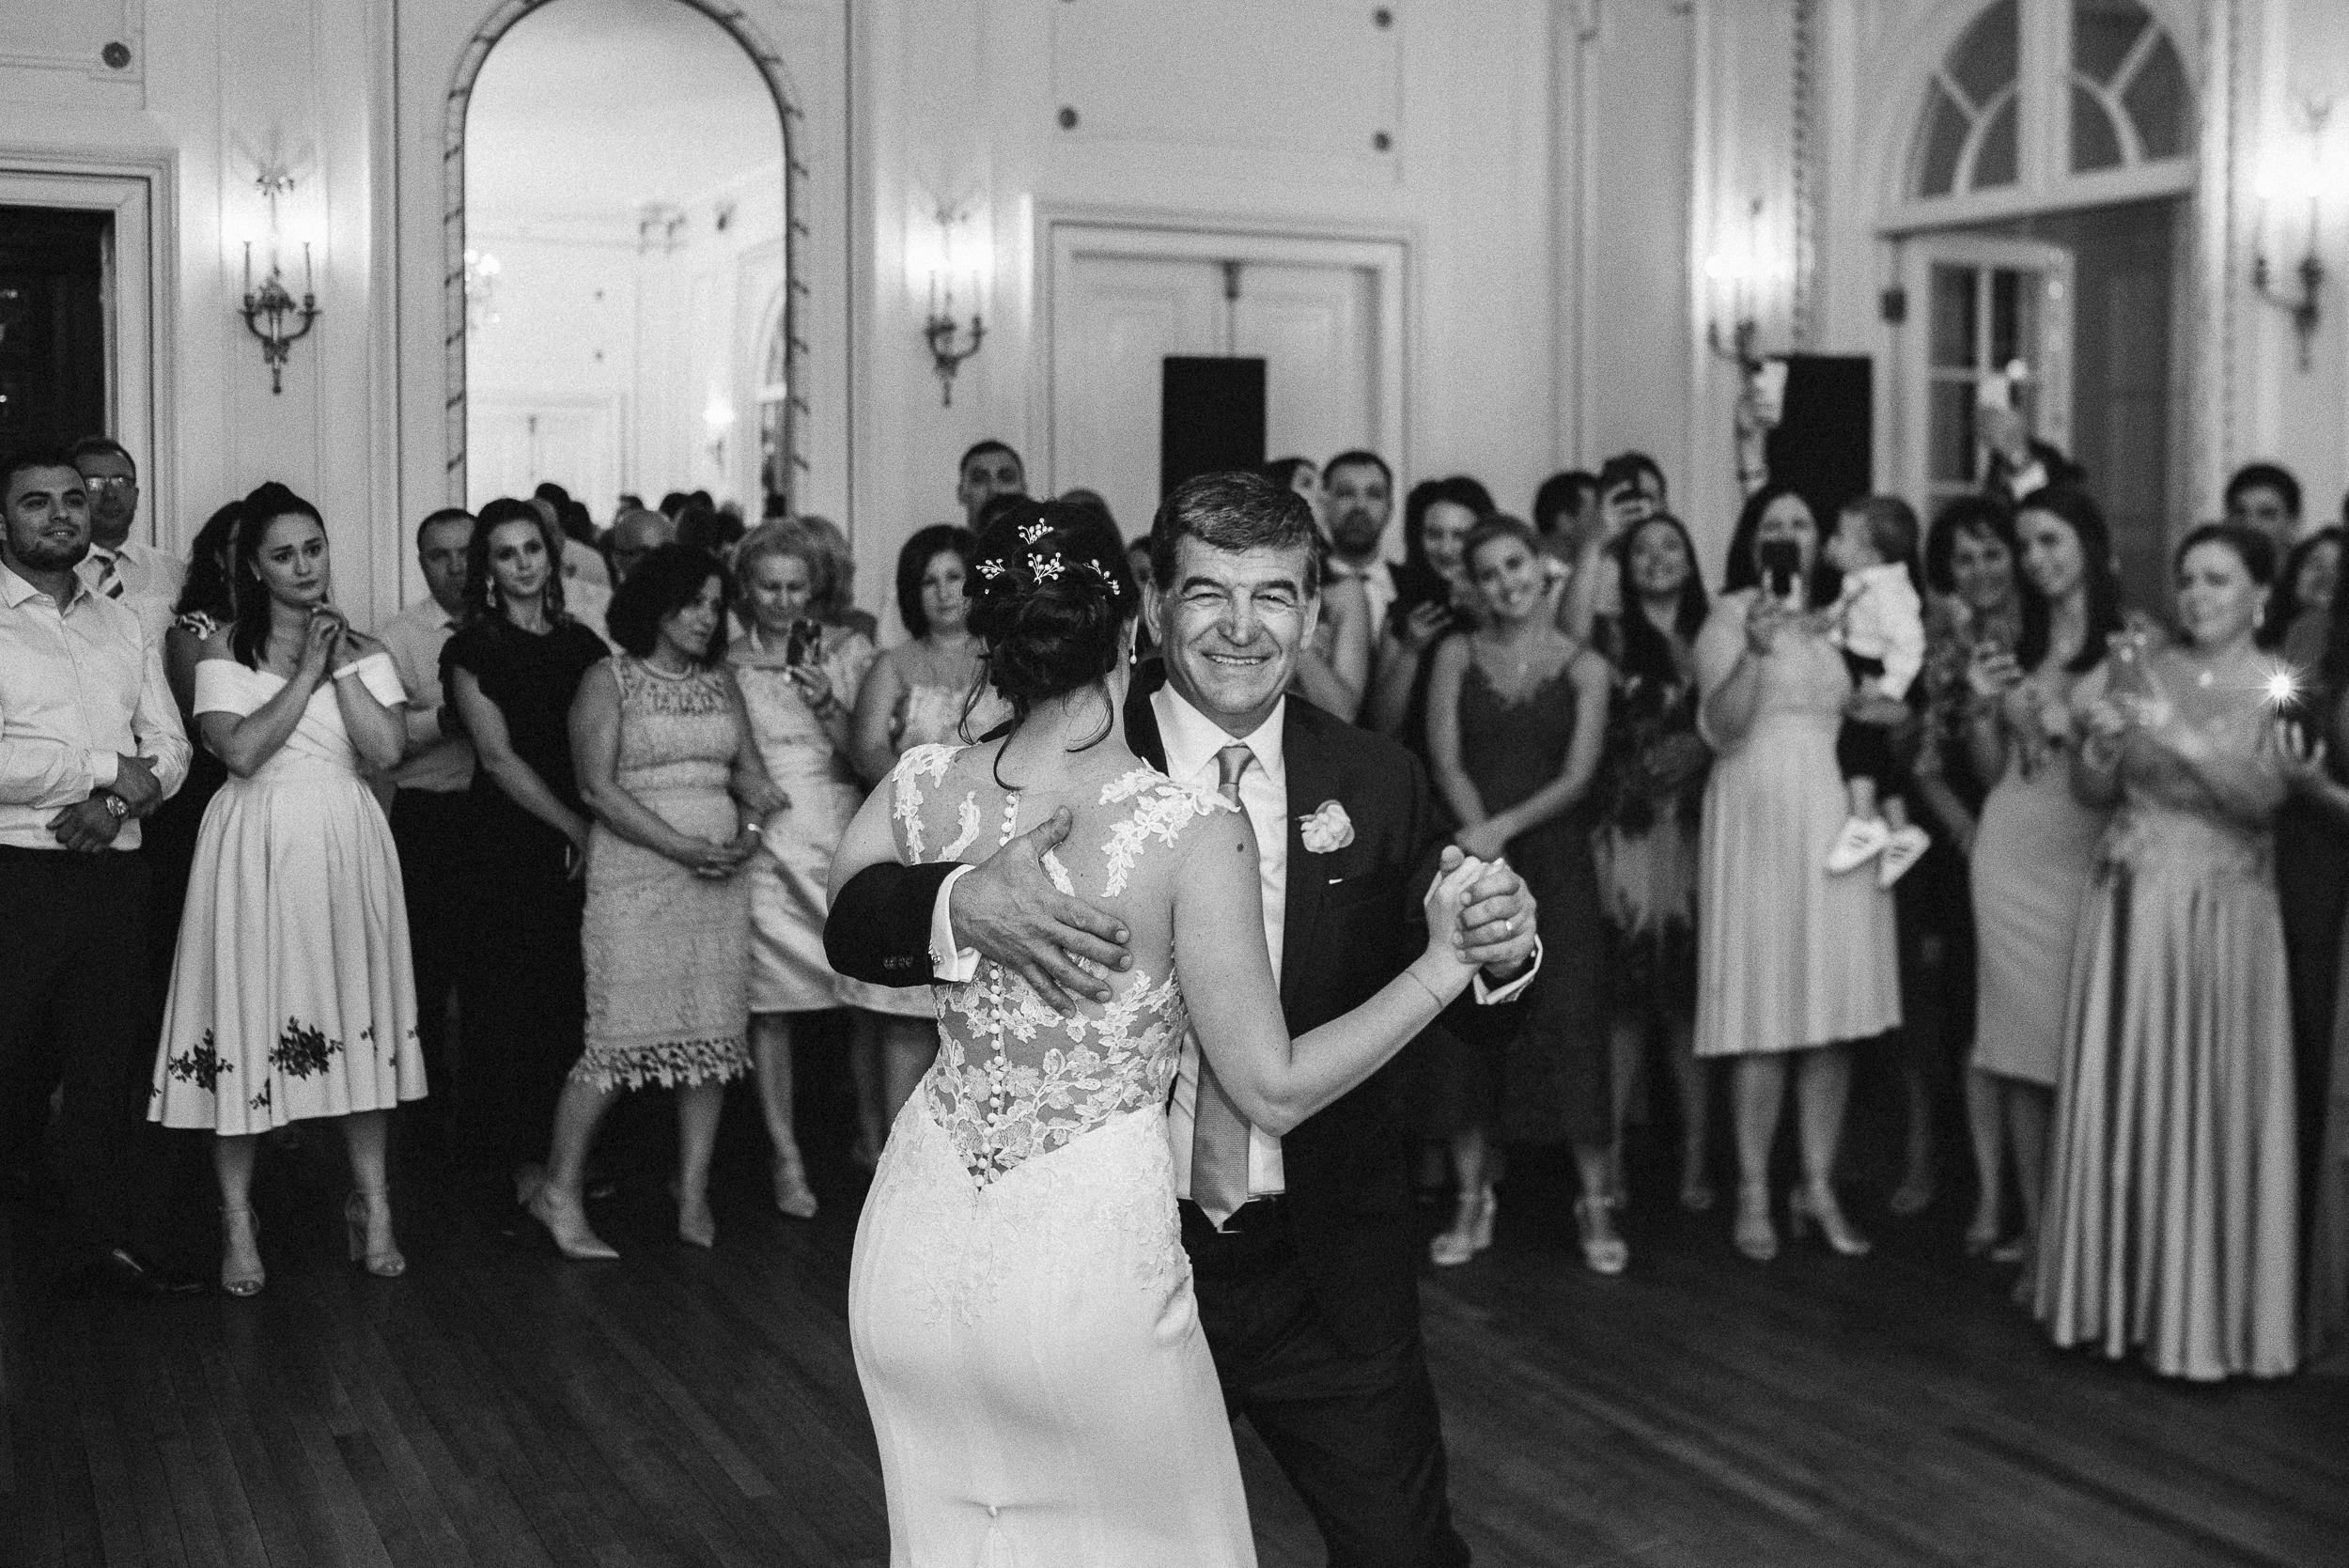 tupper-manor-wedding-photos-0030.JPG